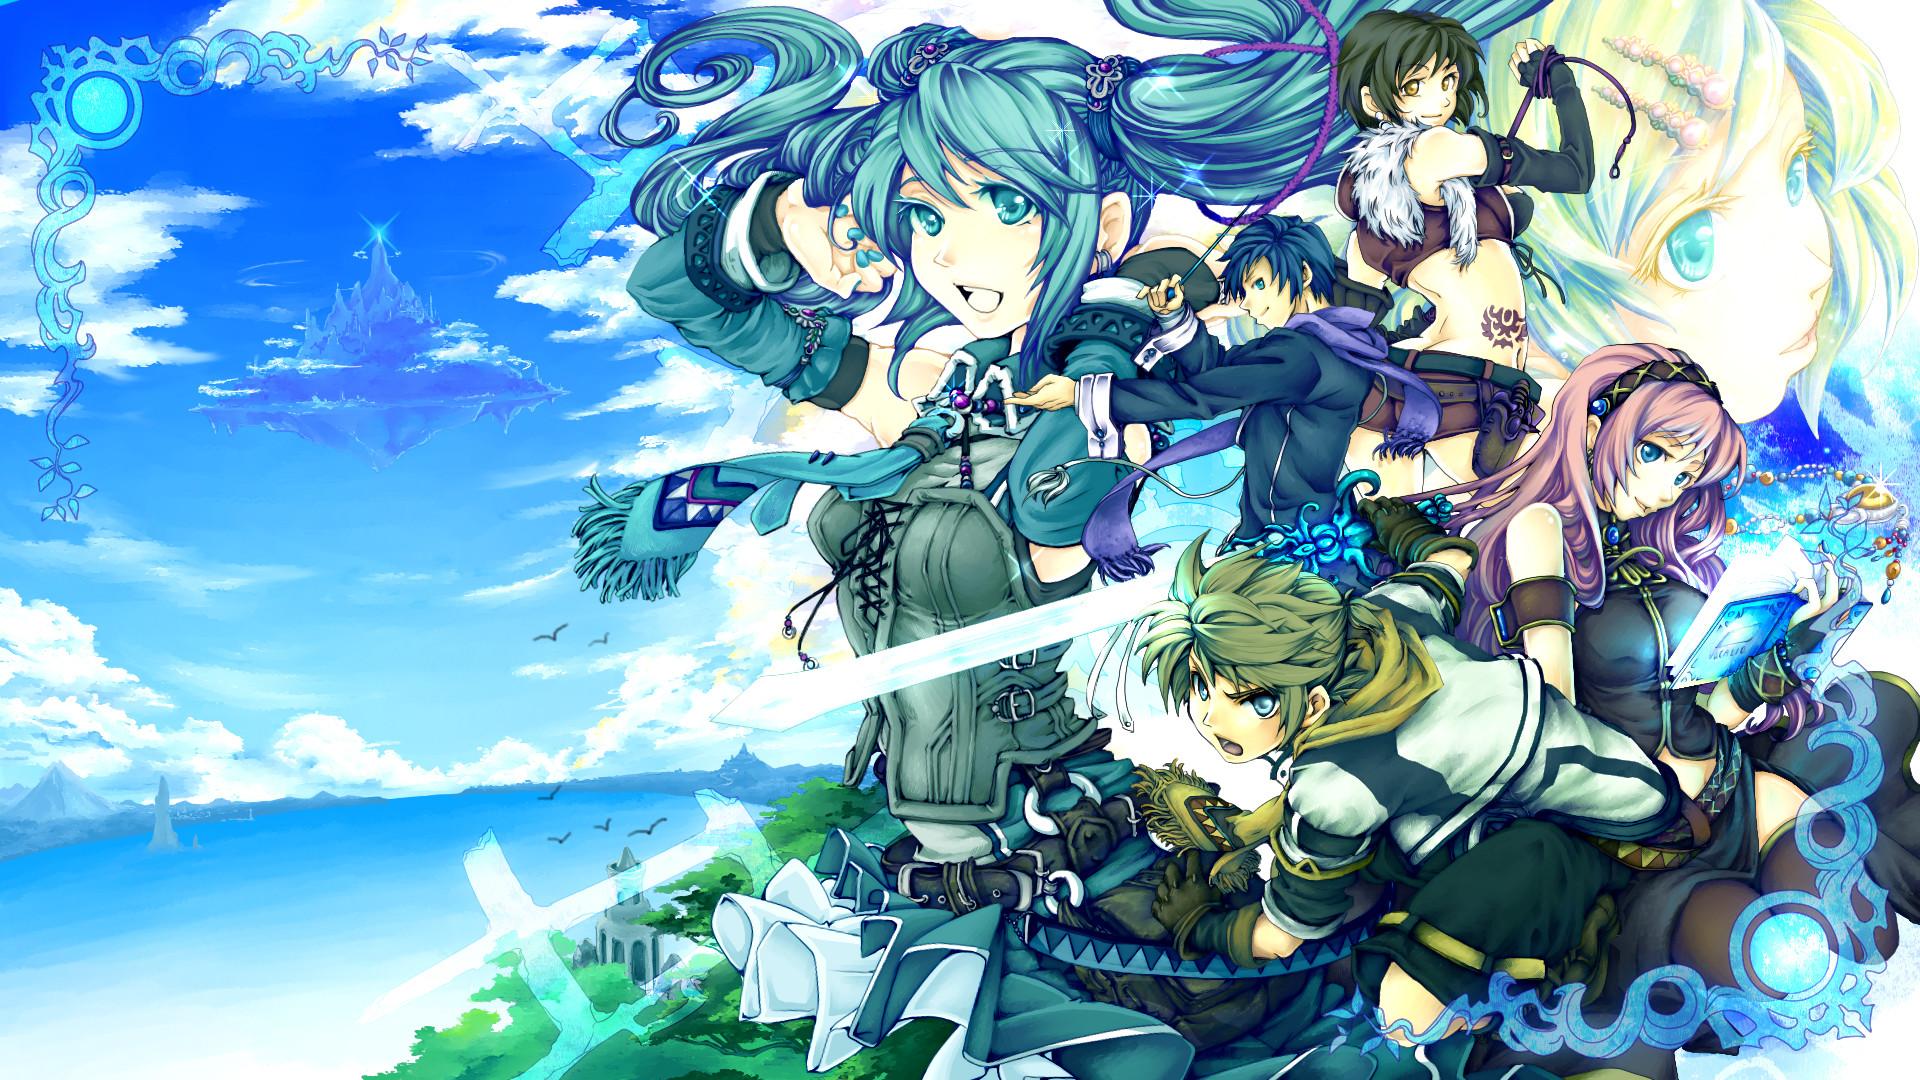 Image Result For Anime Wallpaper Vocaloida